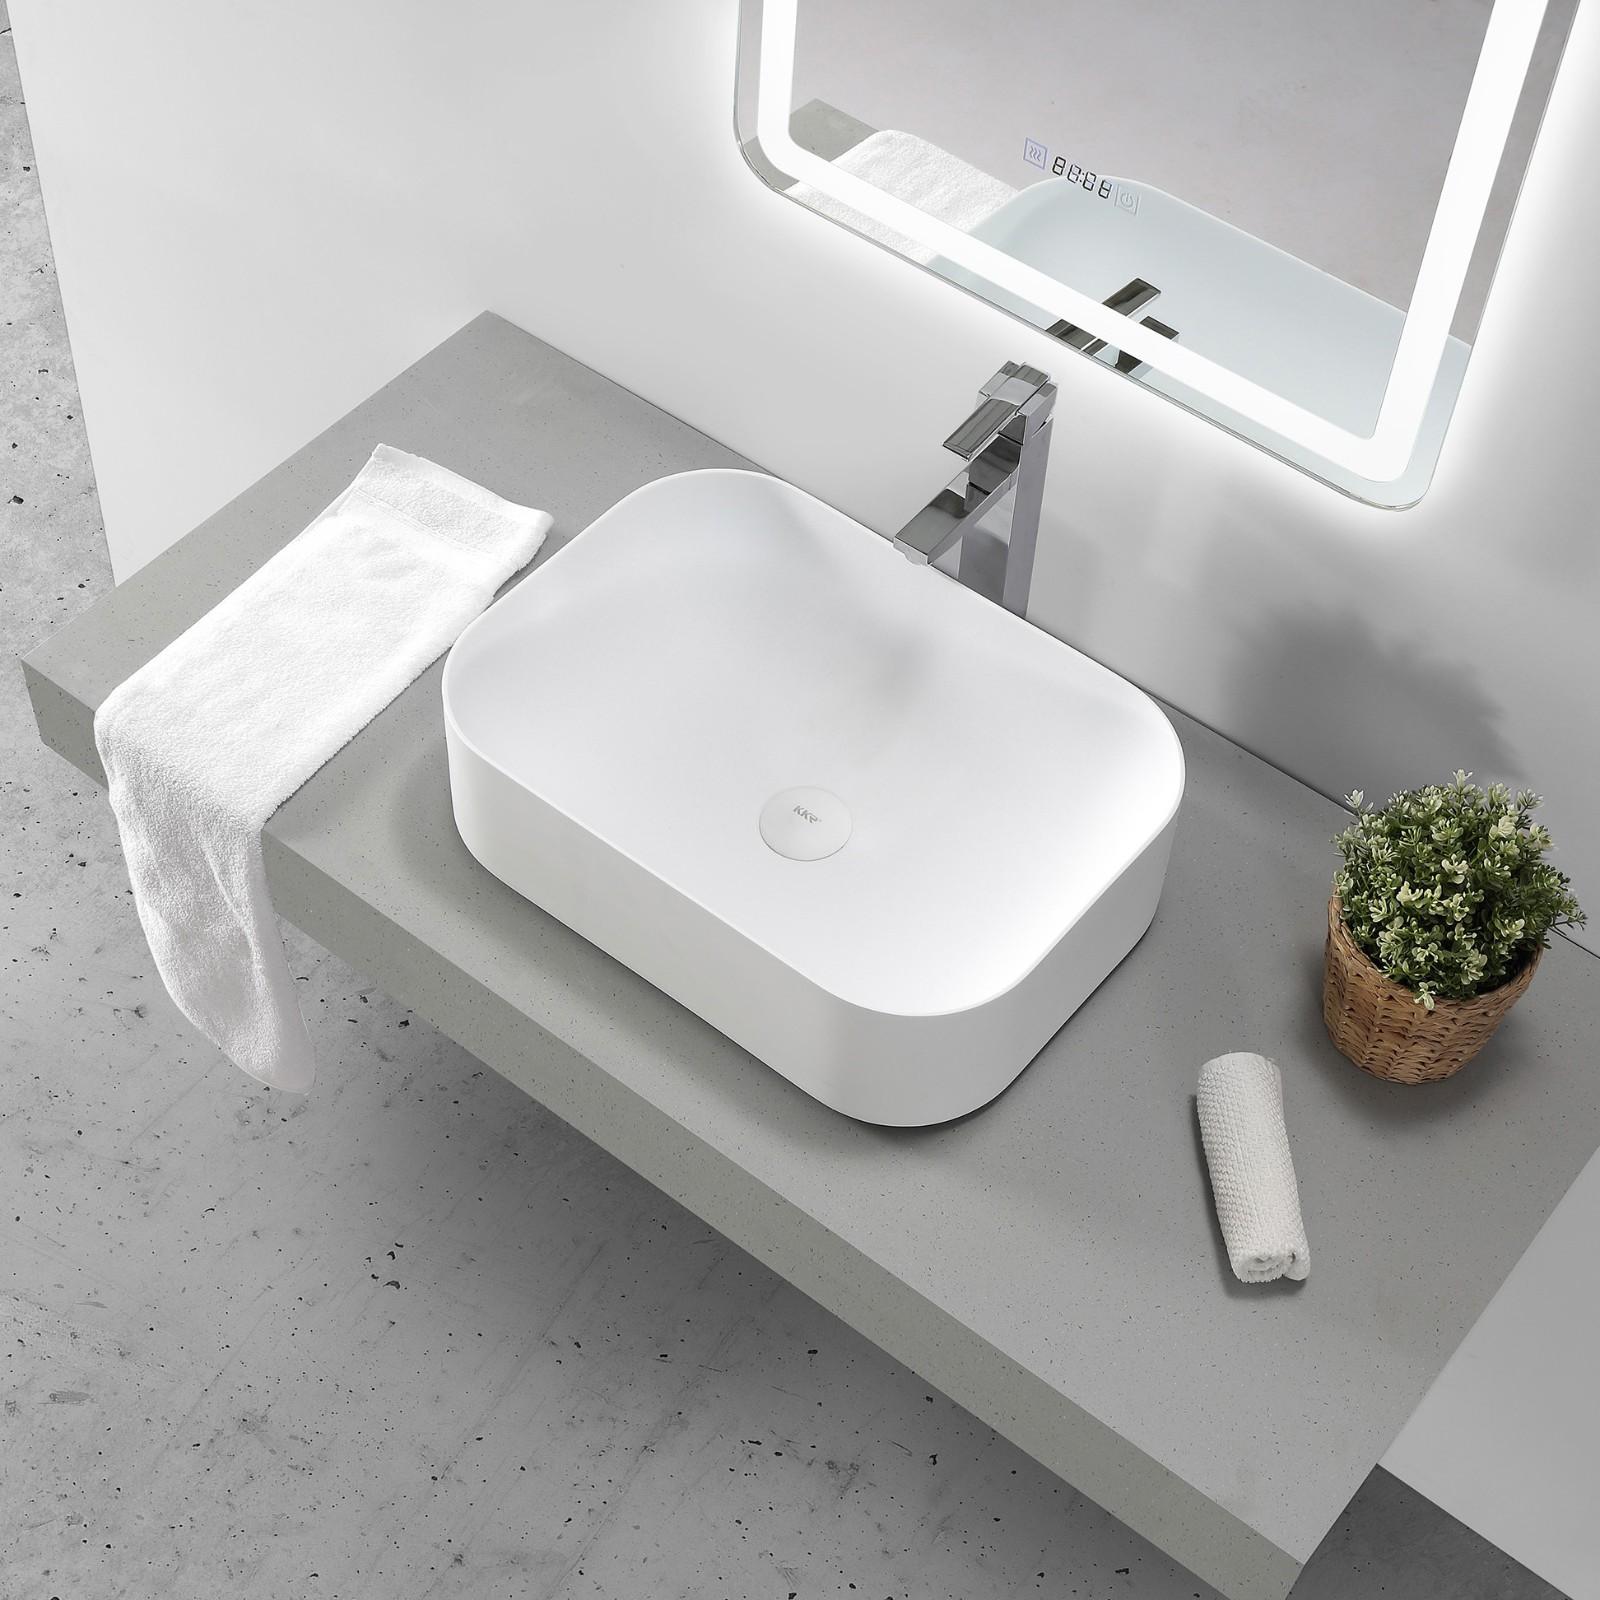 KingKonree excellent small countertop basin design for room-1